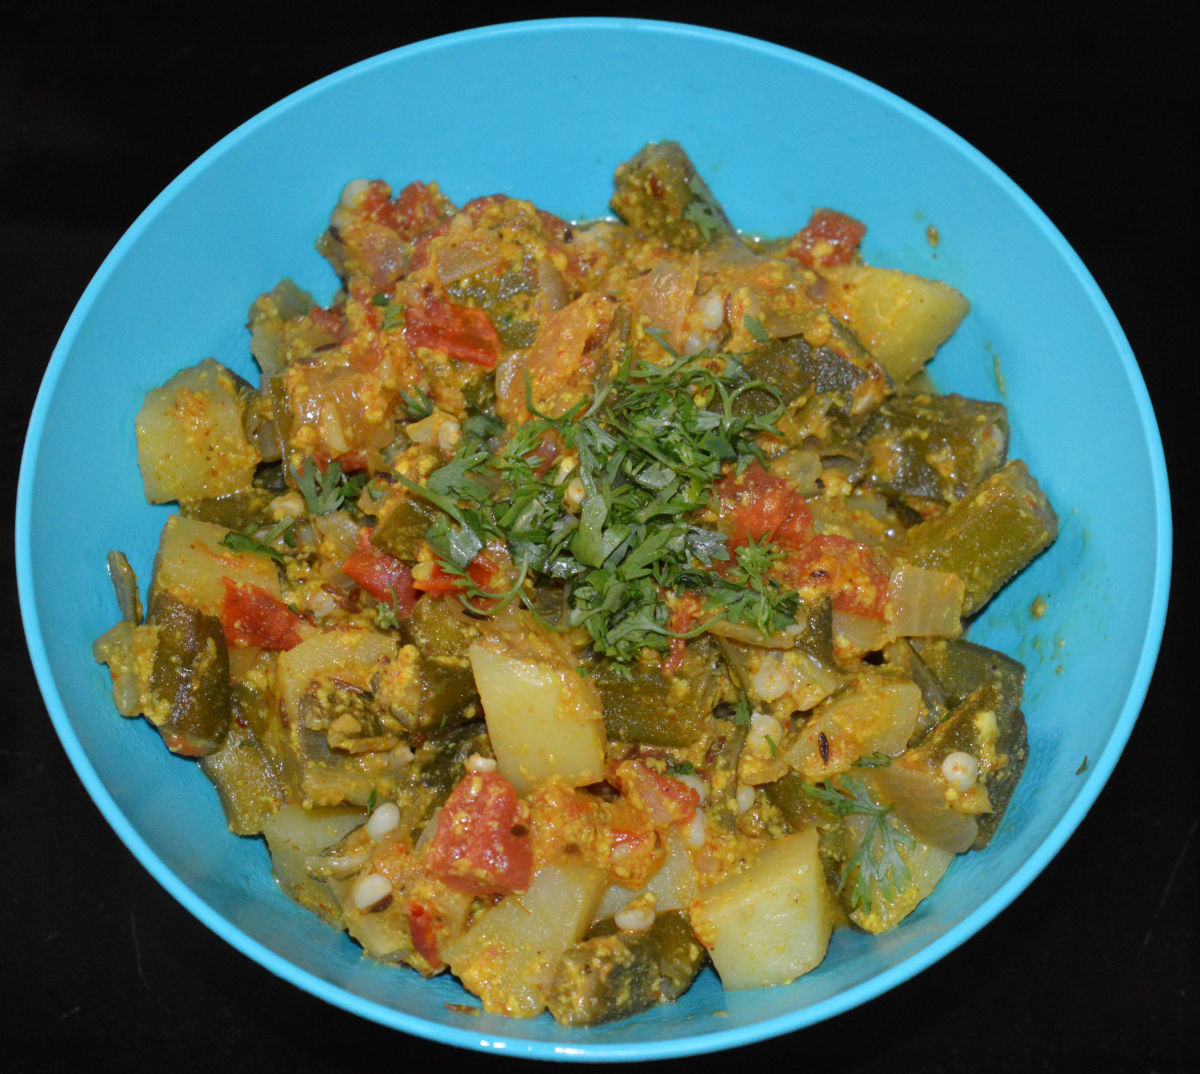 Yogurt-based okra potato curry